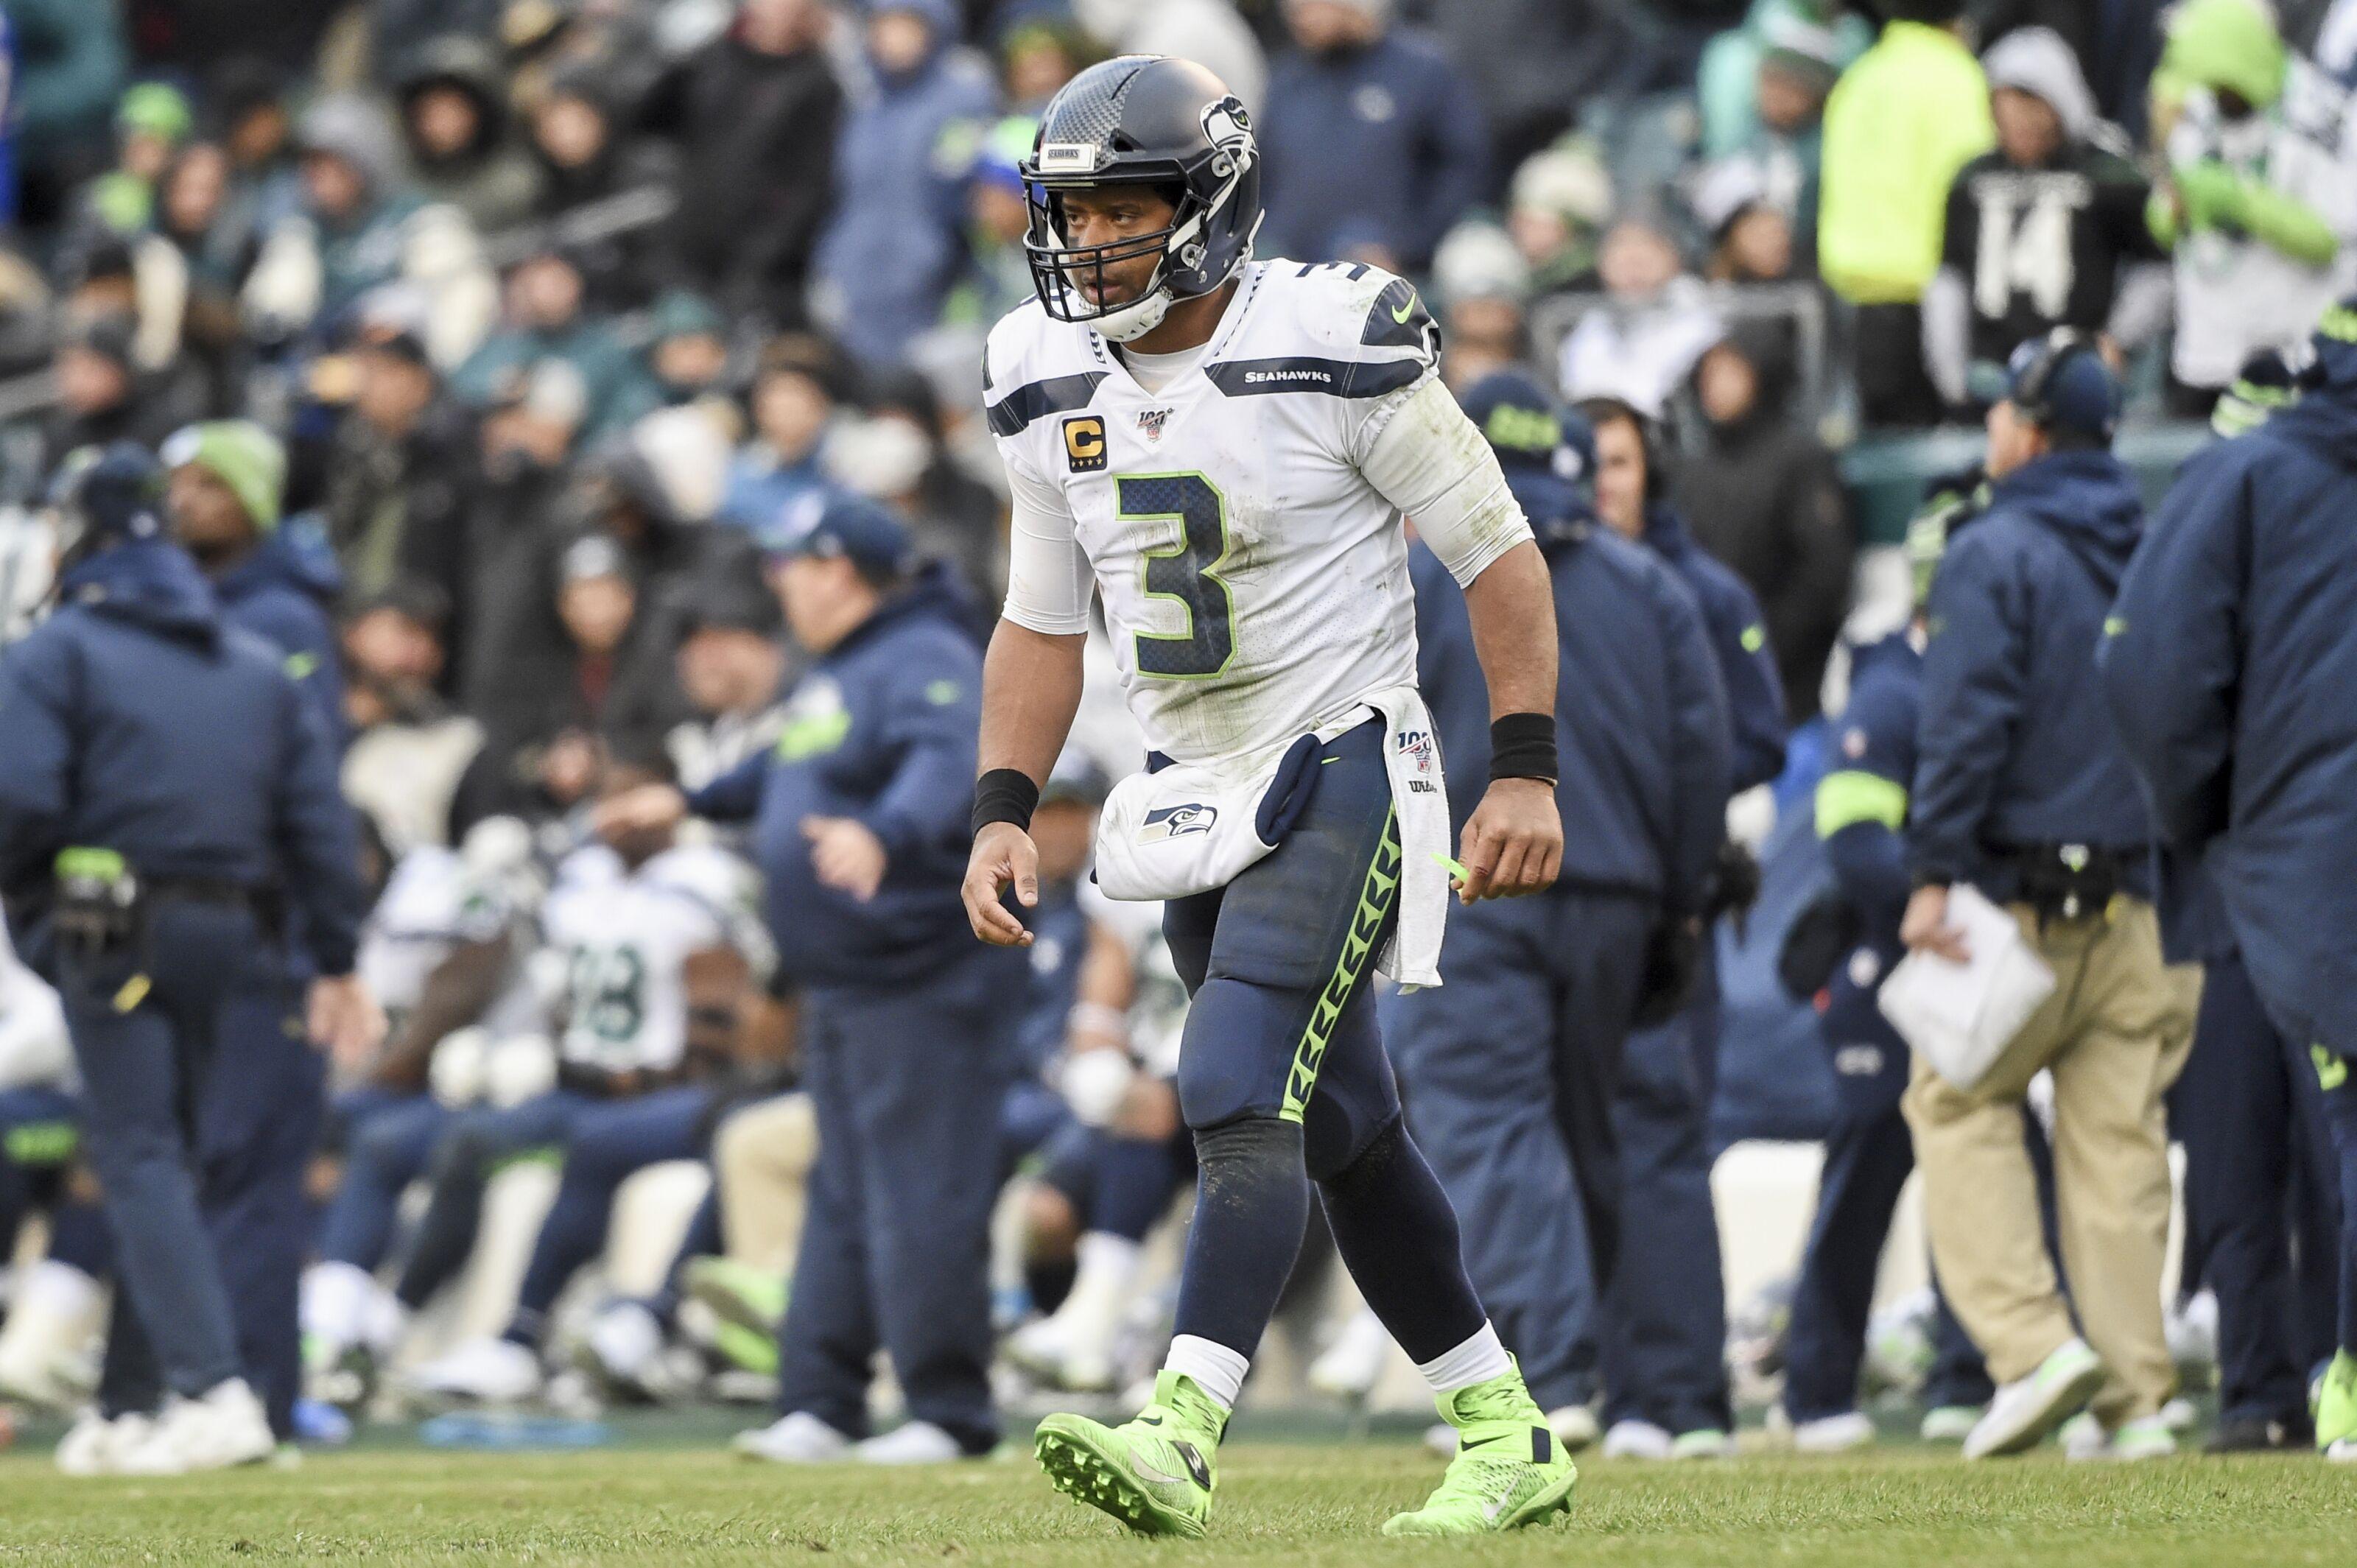 NFL DFS Monday Night Football: FanDuel Single Game Contest Player Picks